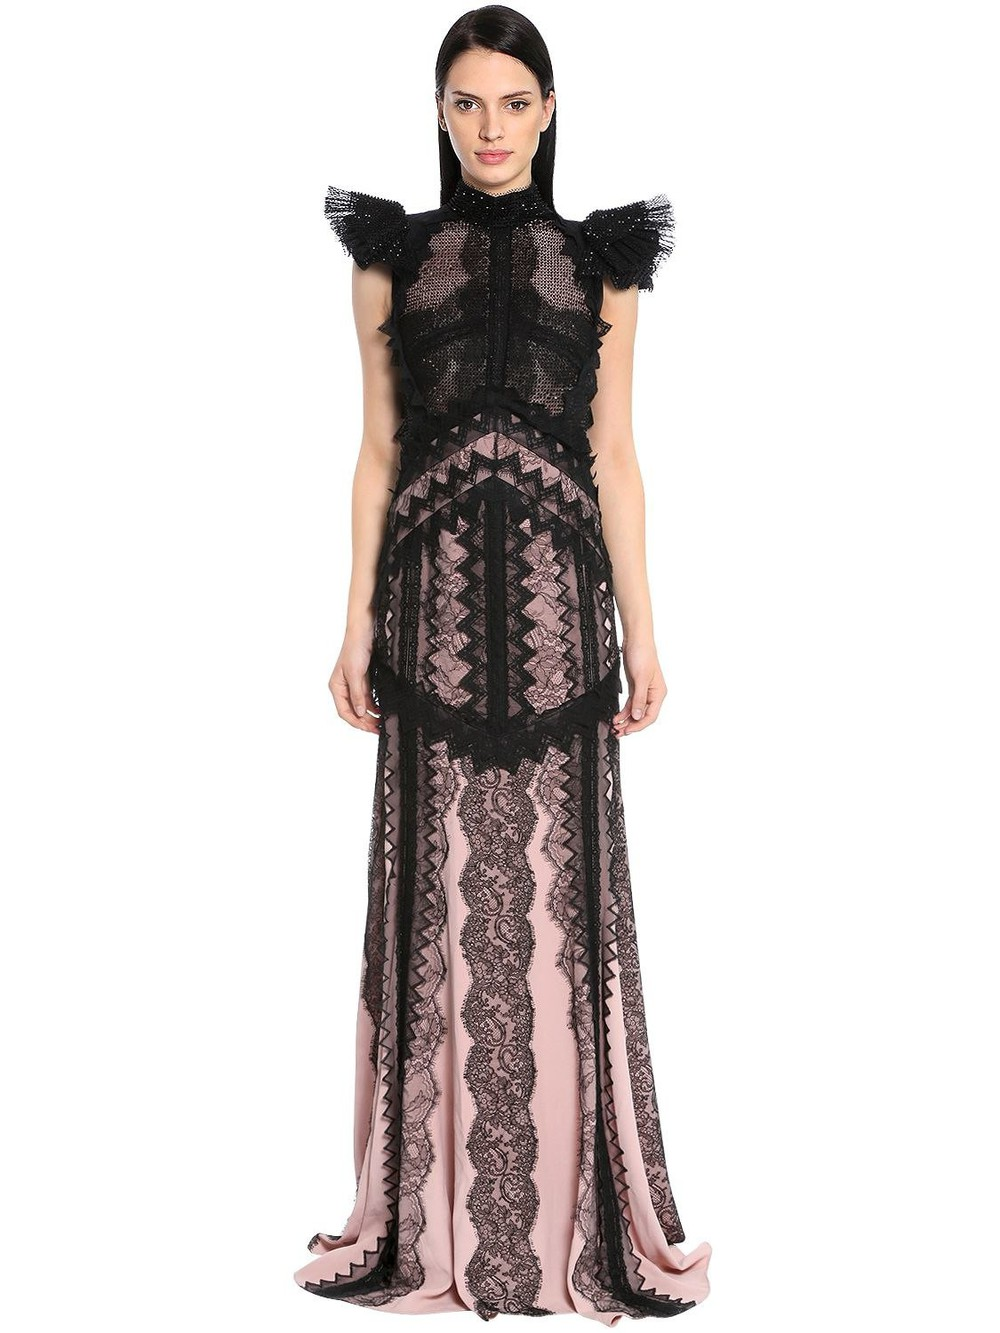 ANTONIO BERARDI Embroidered Chiffon & Envers Satin Gown in black / pink